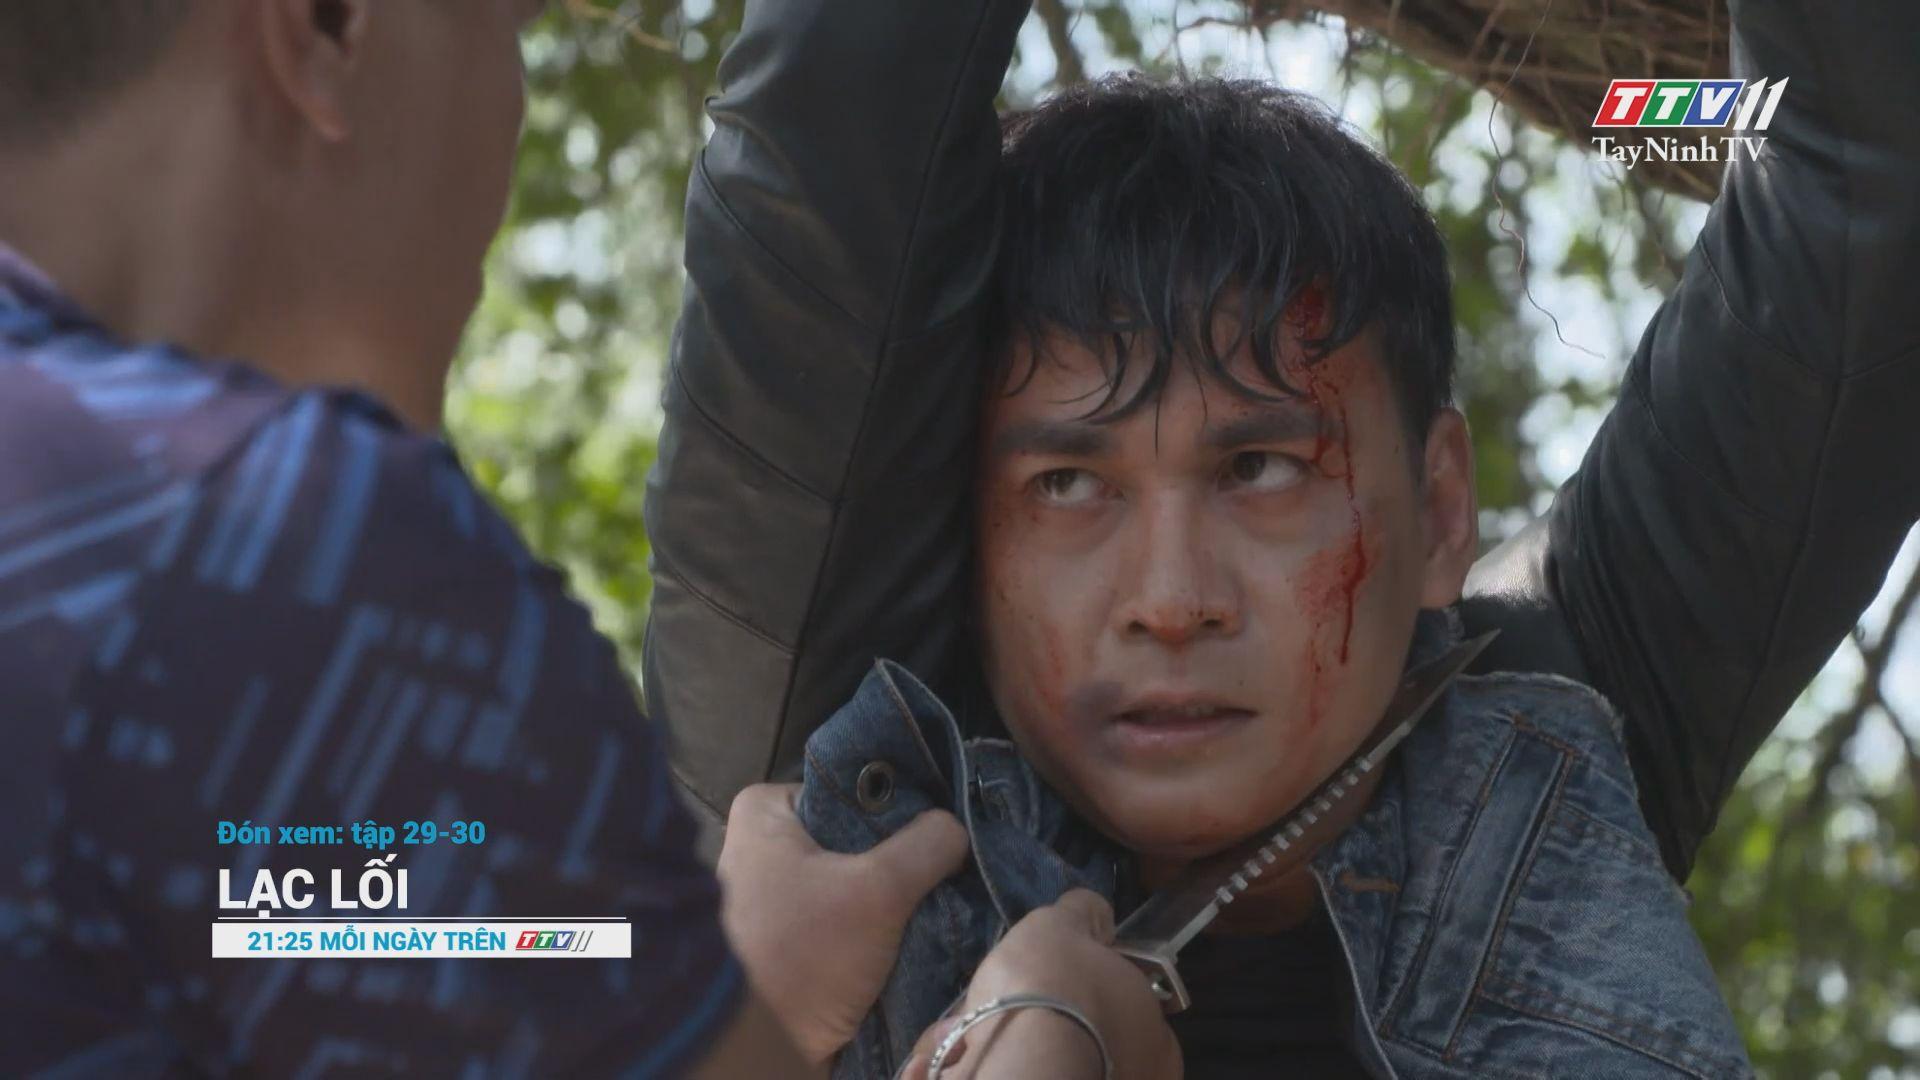 Phim LẠC LỐI - Trailer TẬP 29-30   GIỚI THIỆU PHIM   TayNinhTV